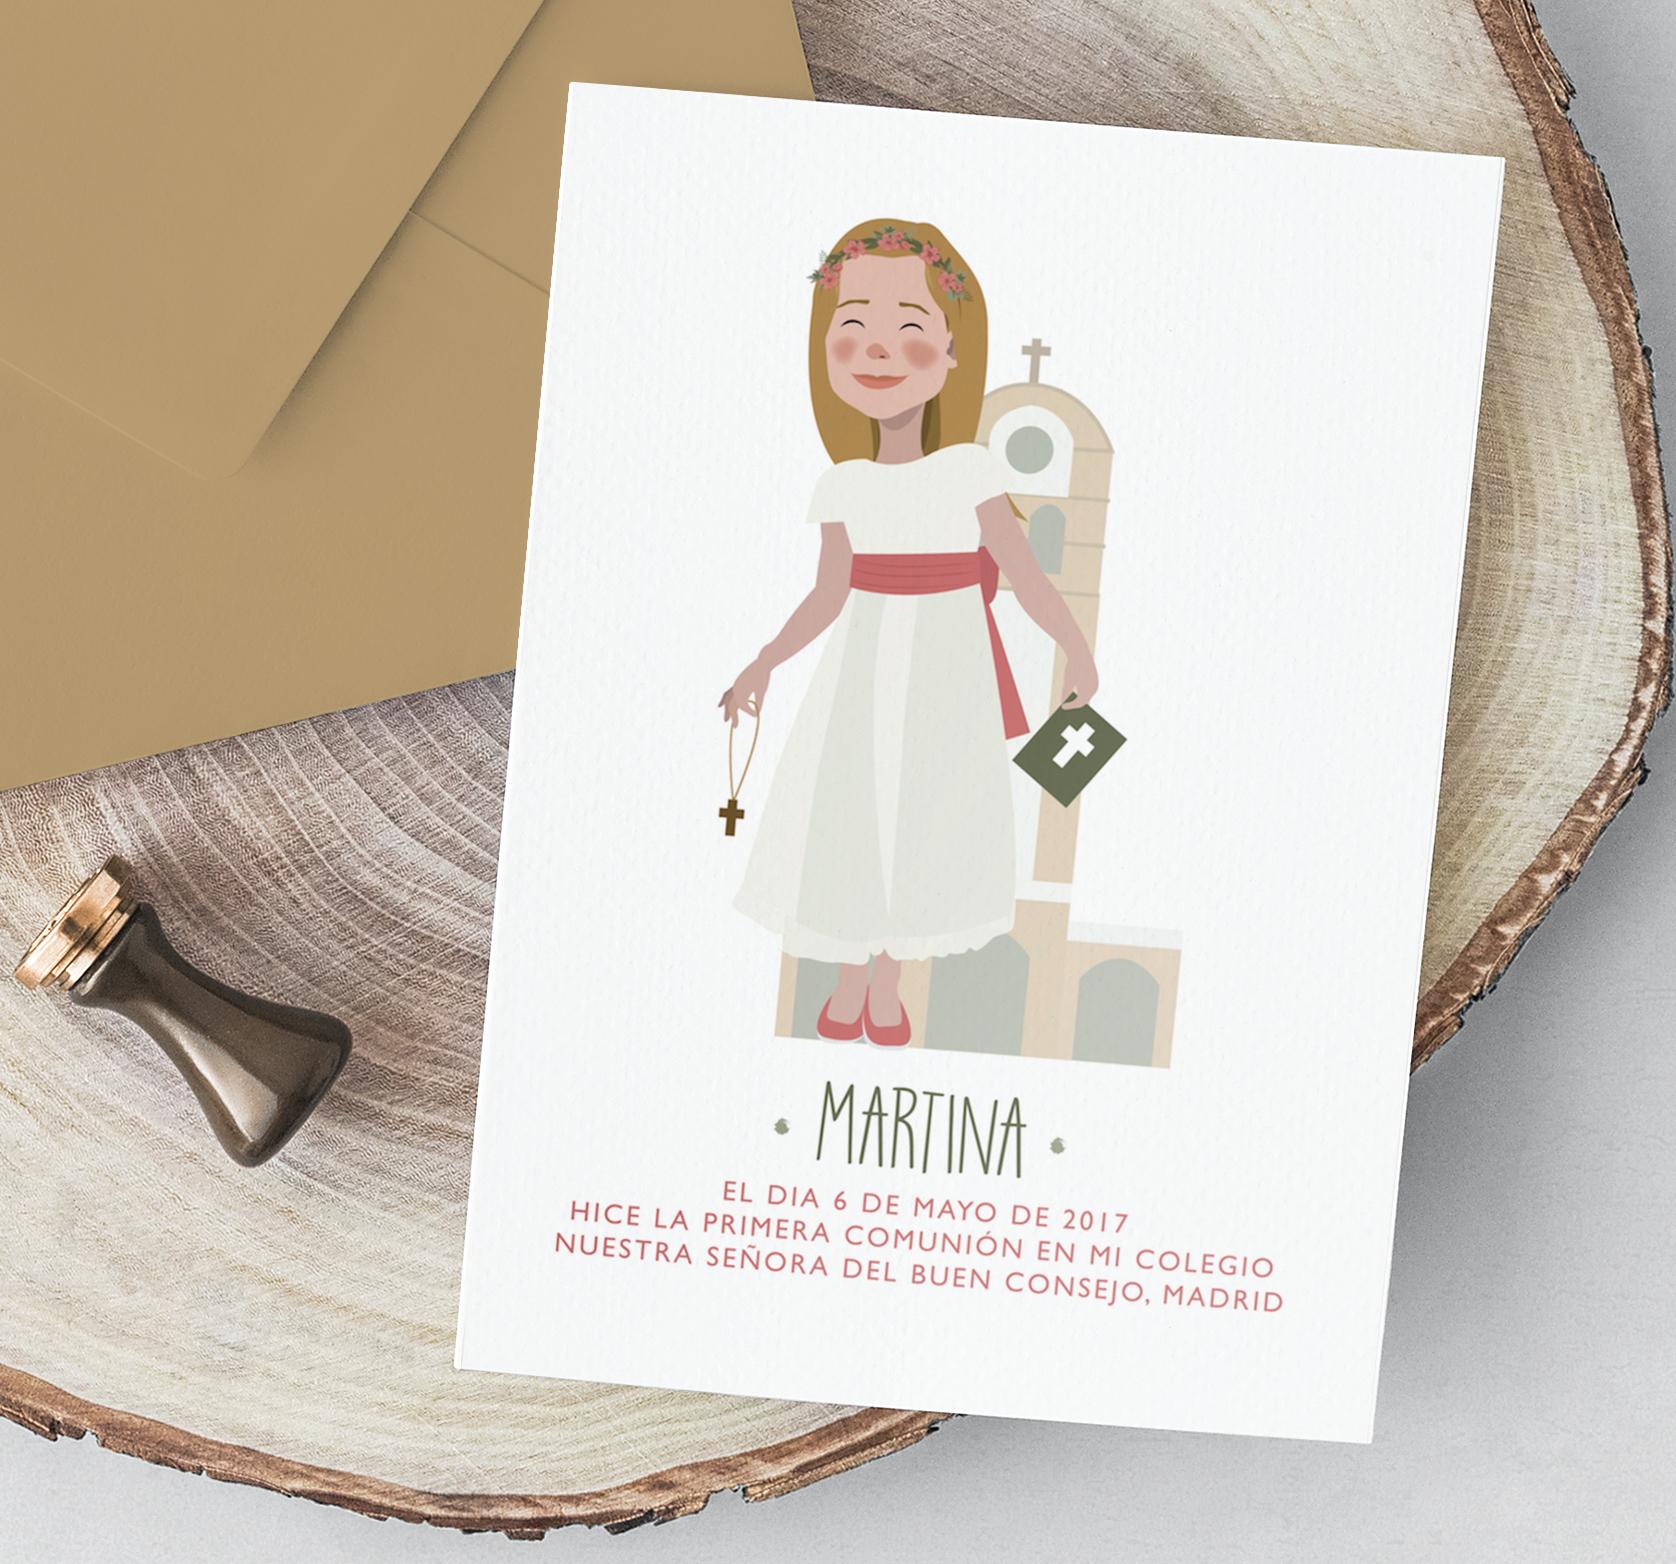 ilustracion-personalizada-niño-niña-recordatorio-comunion-primeracomunion-diseño-original-mdebenito-asturias.jpg